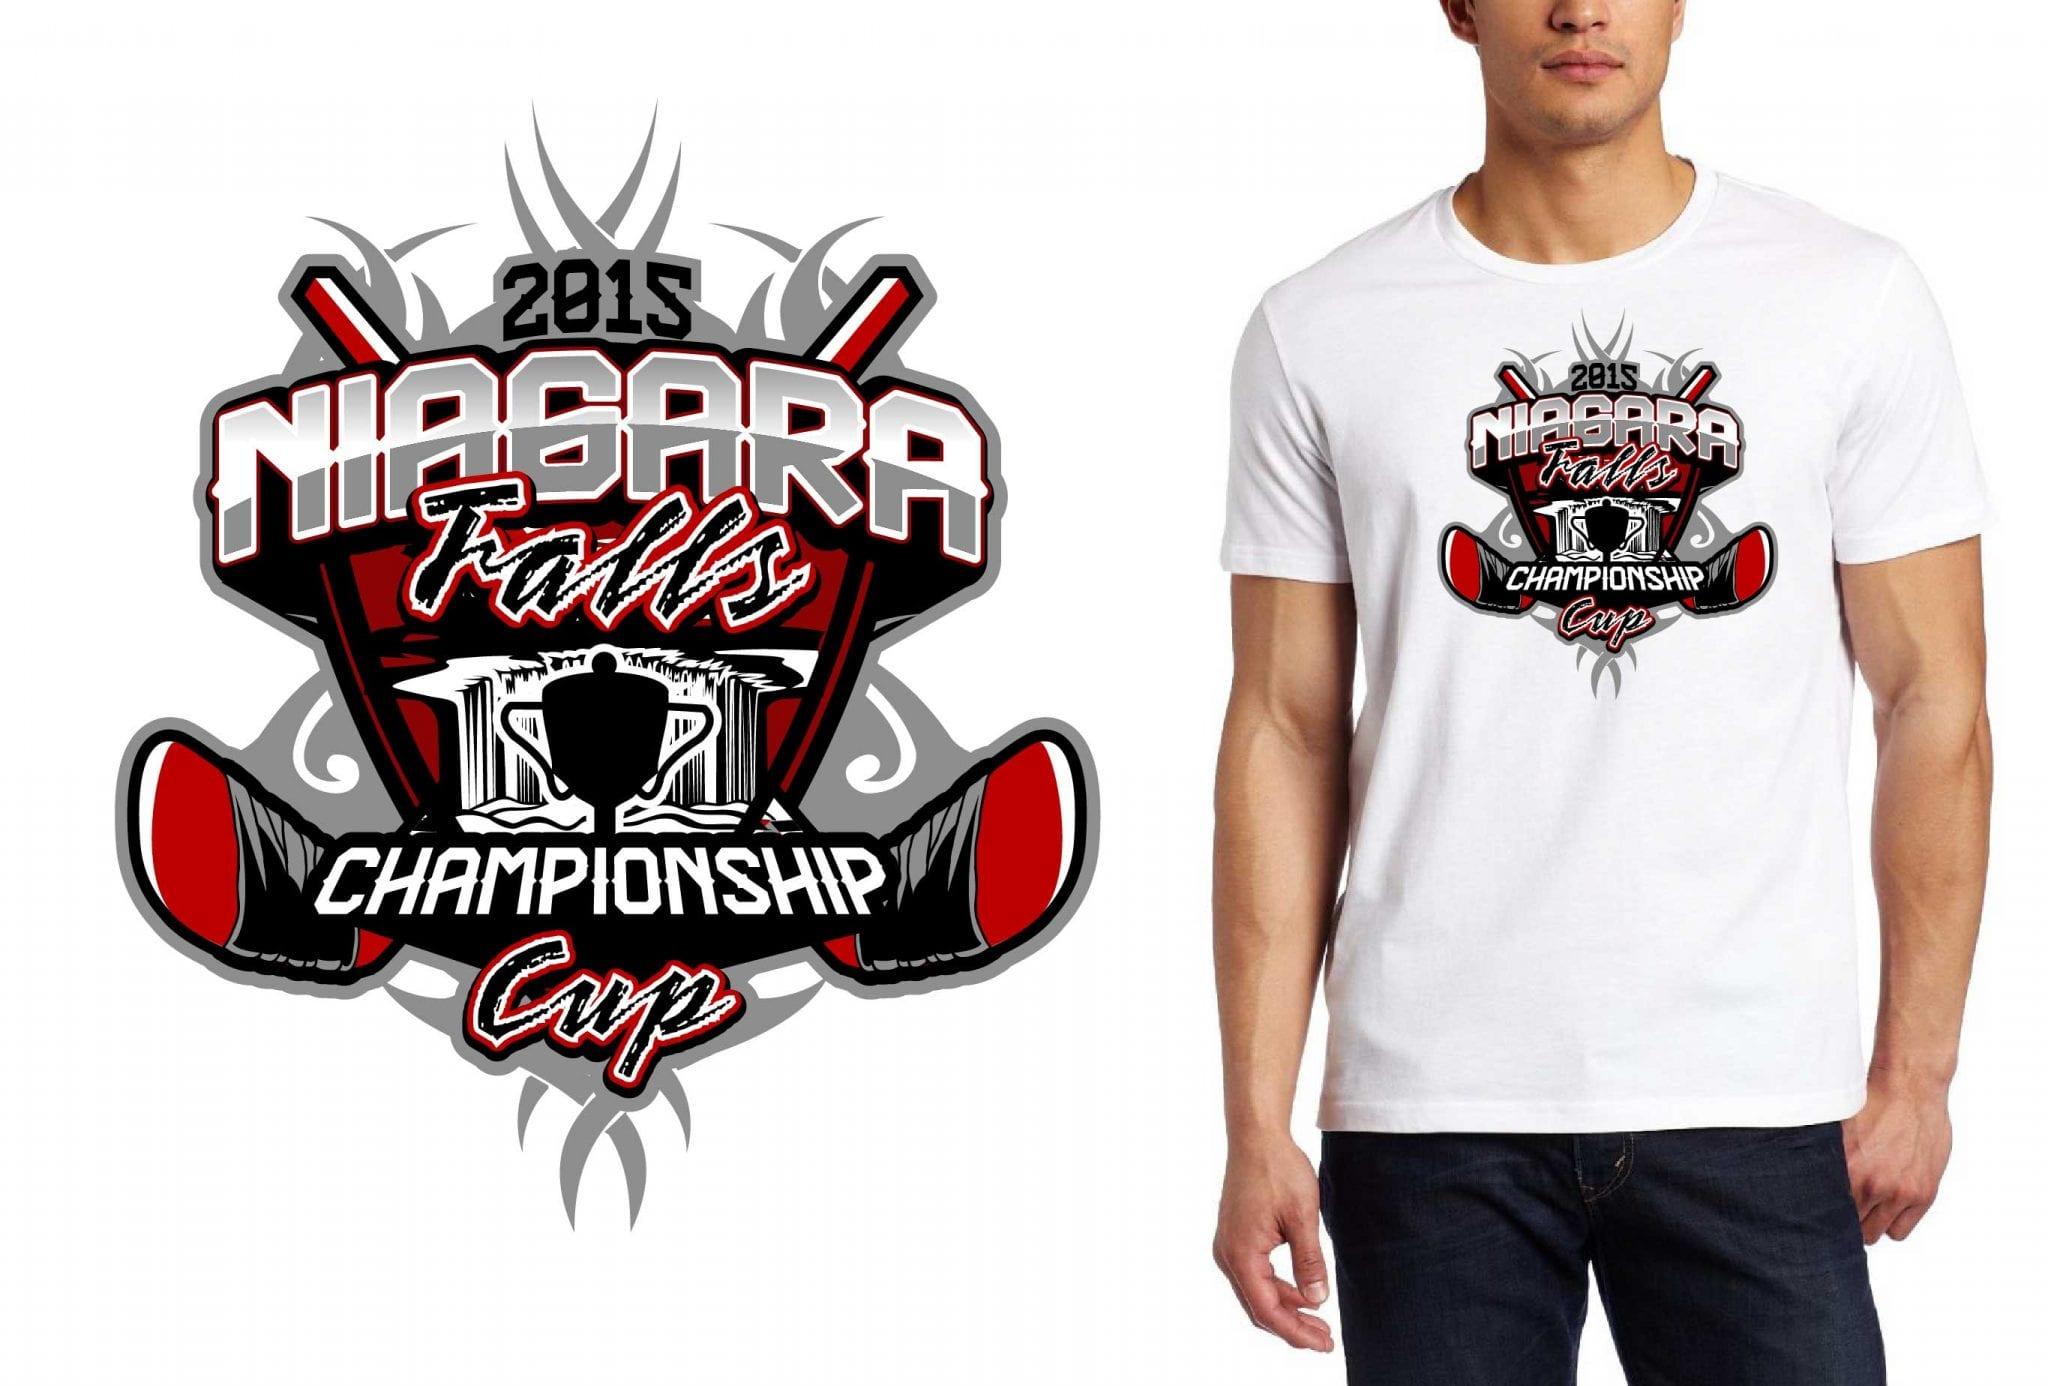 2015 Niagara Falls - Championship Cup